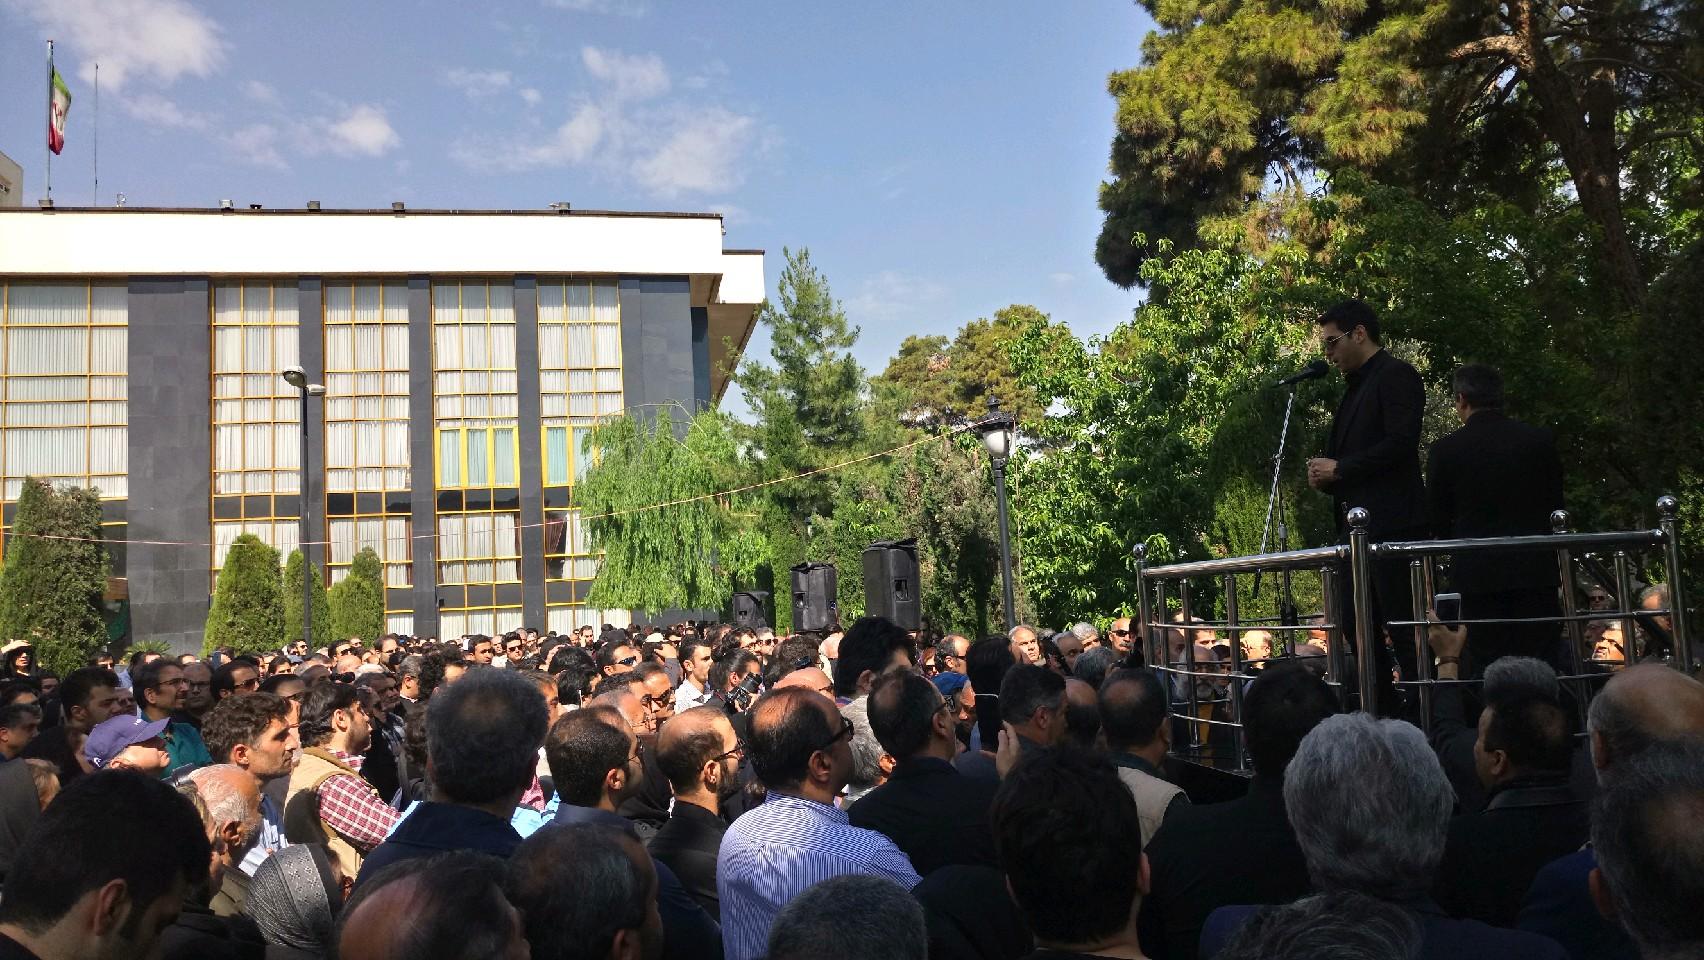 آغاز مراسم تشییع پیکر ناصر چشم آذر